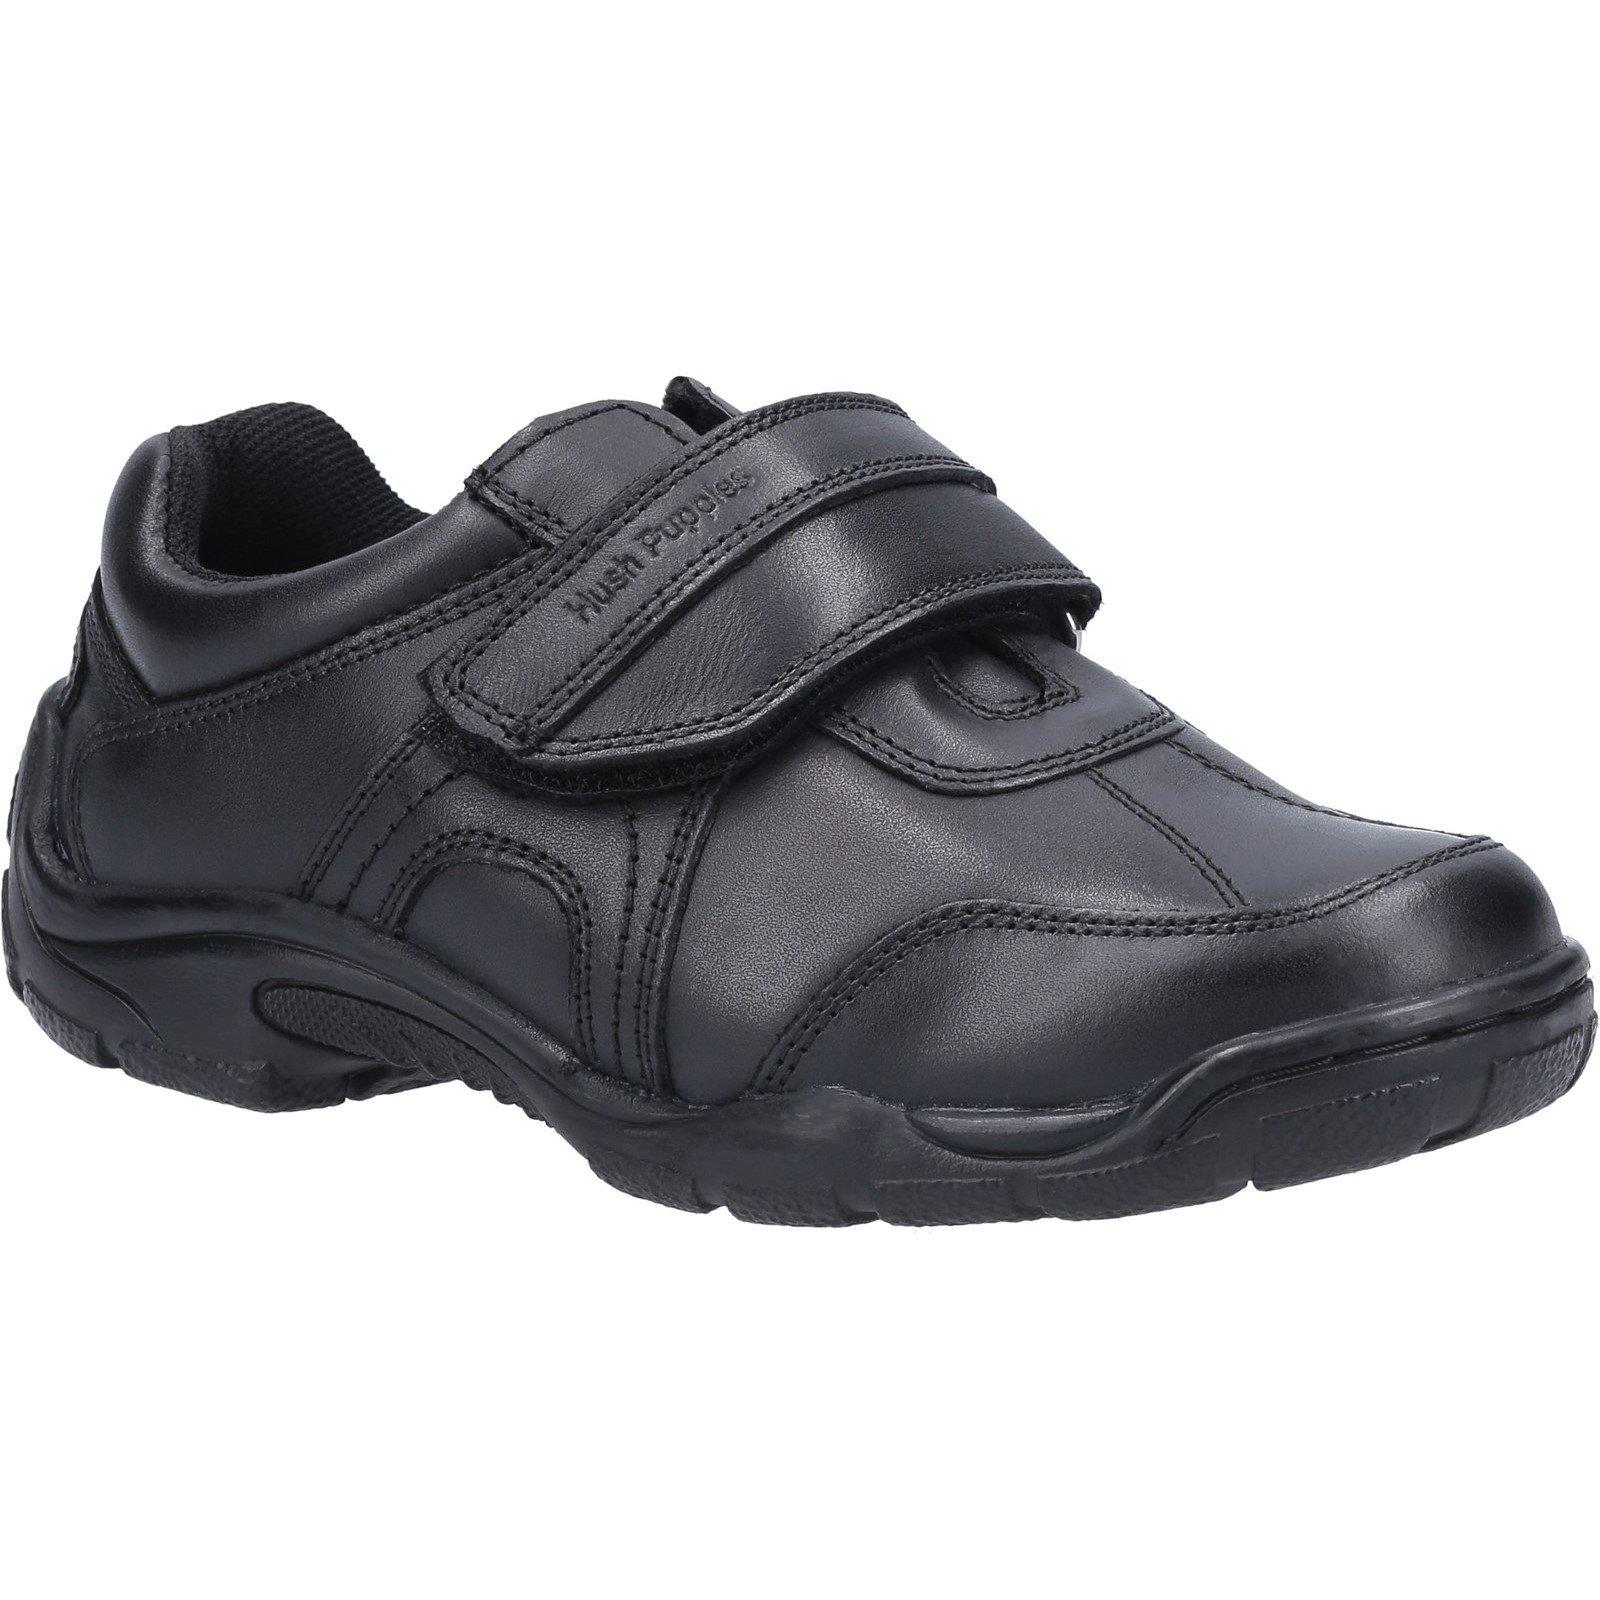 Hush Puppies Kid's Arlo Junior School Shoe Black 30853 - Black 11